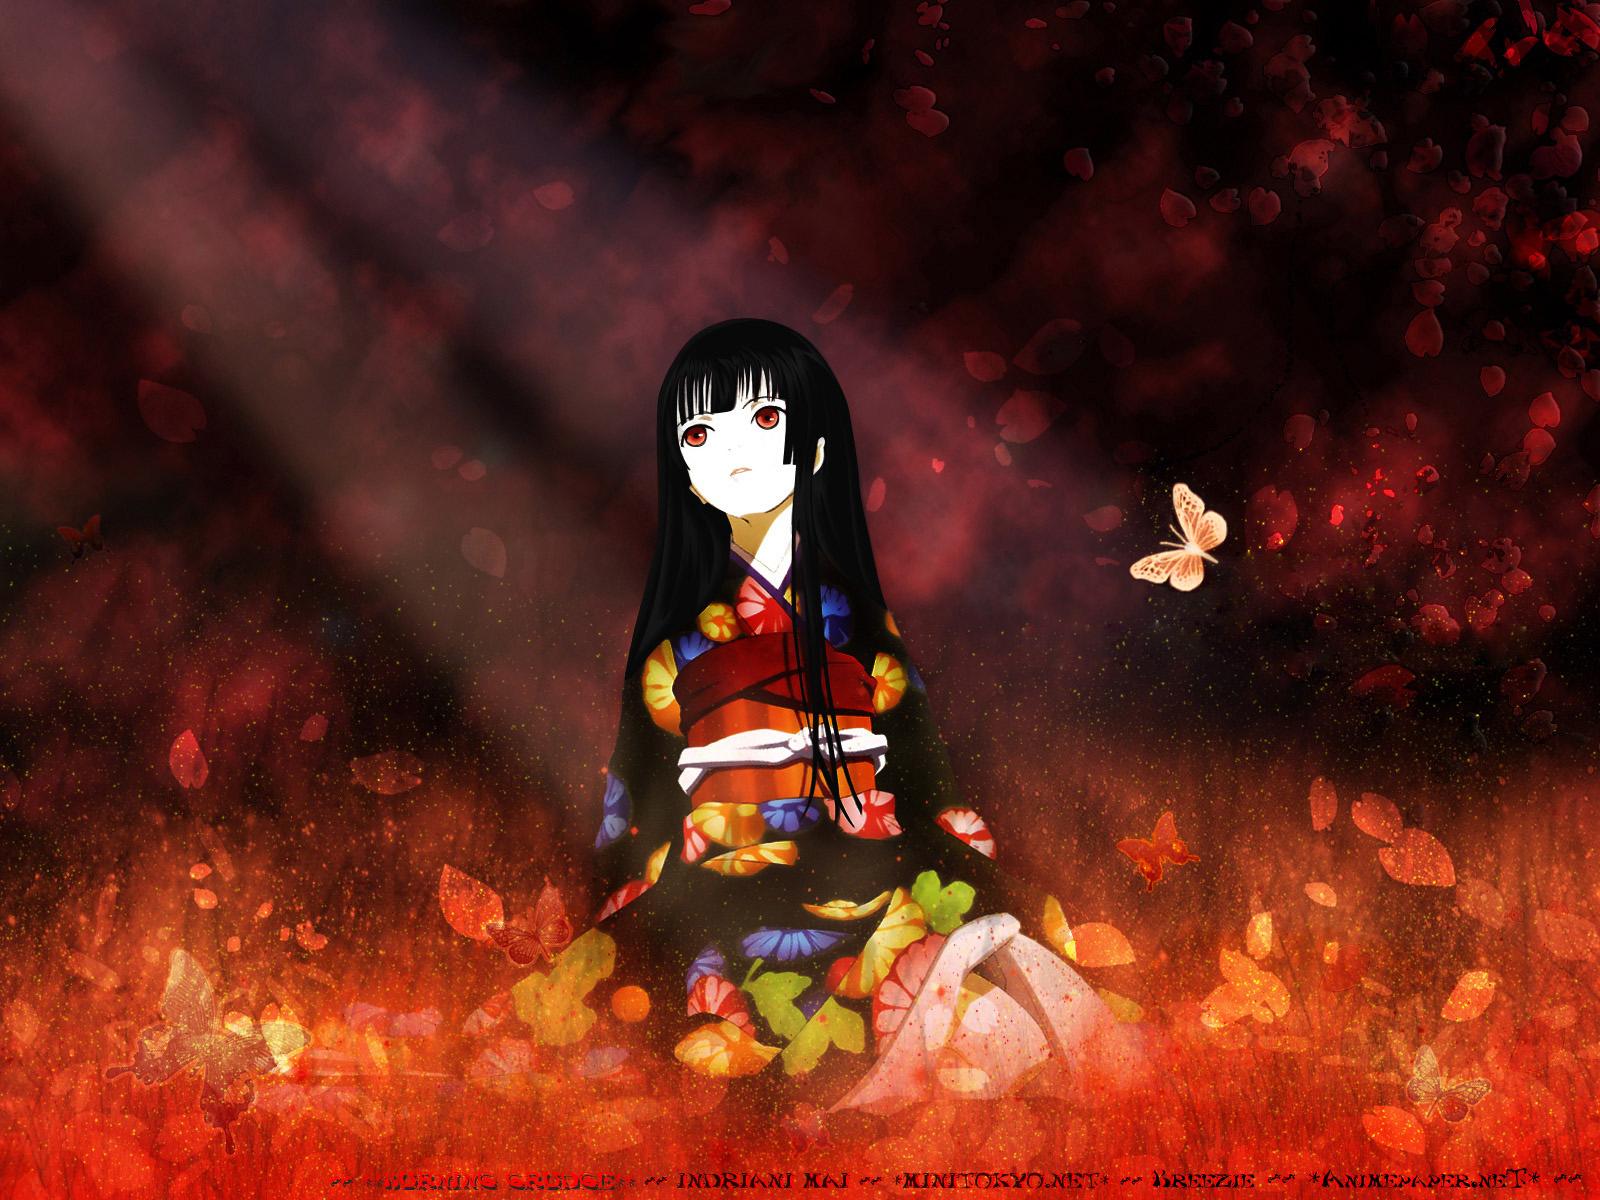 Jigoku Shojo Hell Girl ea wallpaper 1600x1200 136561 WallpaperUP 1600x1200